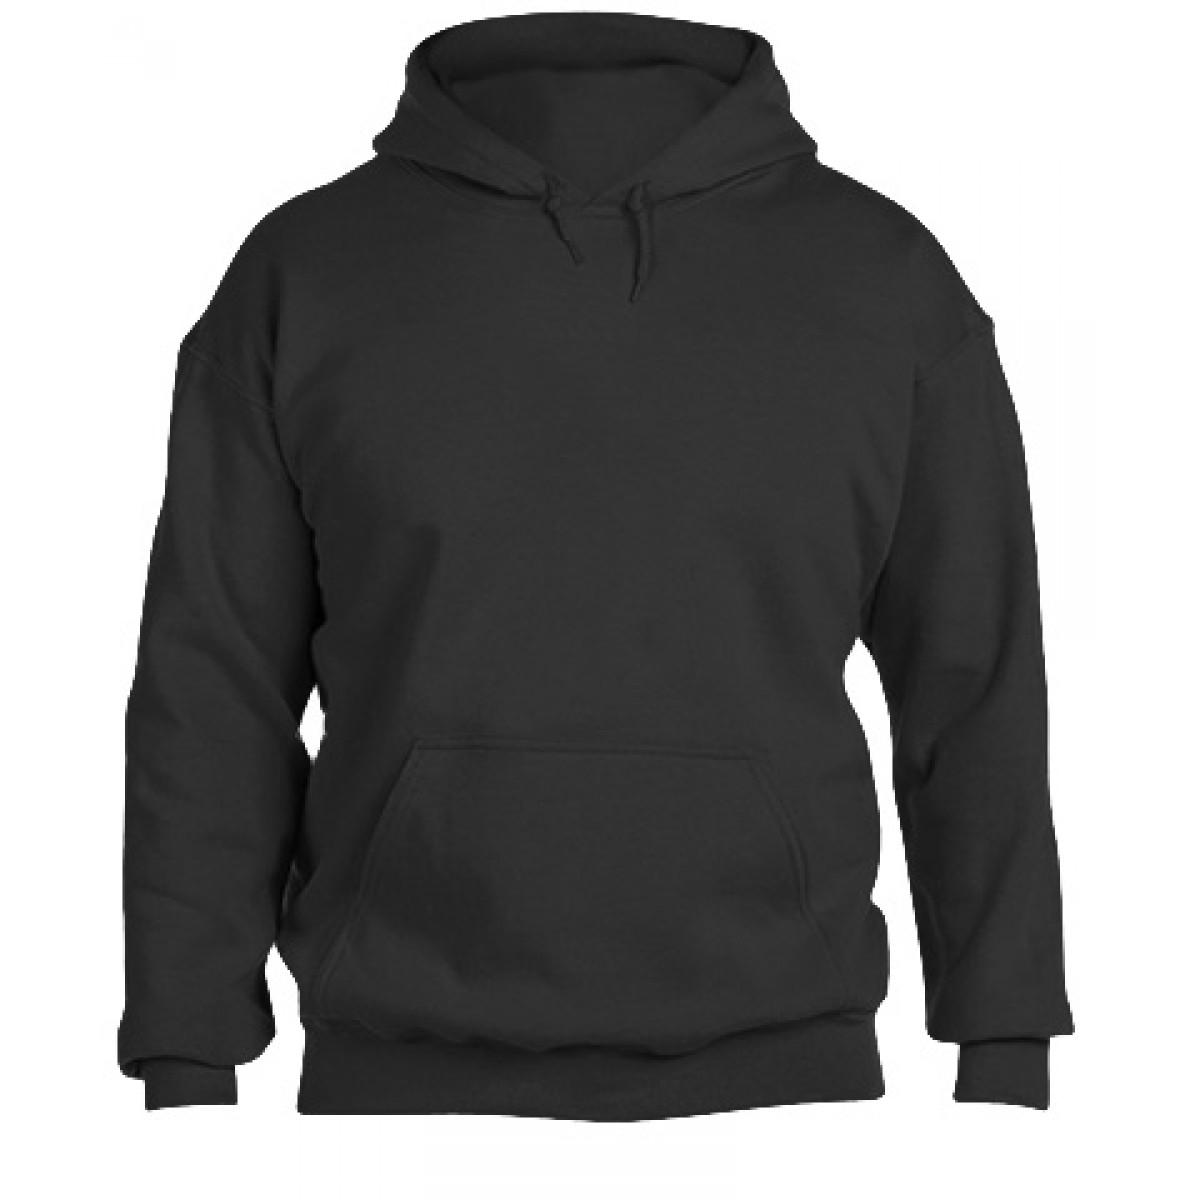 Solid Hooded Sweatshirt  50/50 Heavy Blend-Black-XL